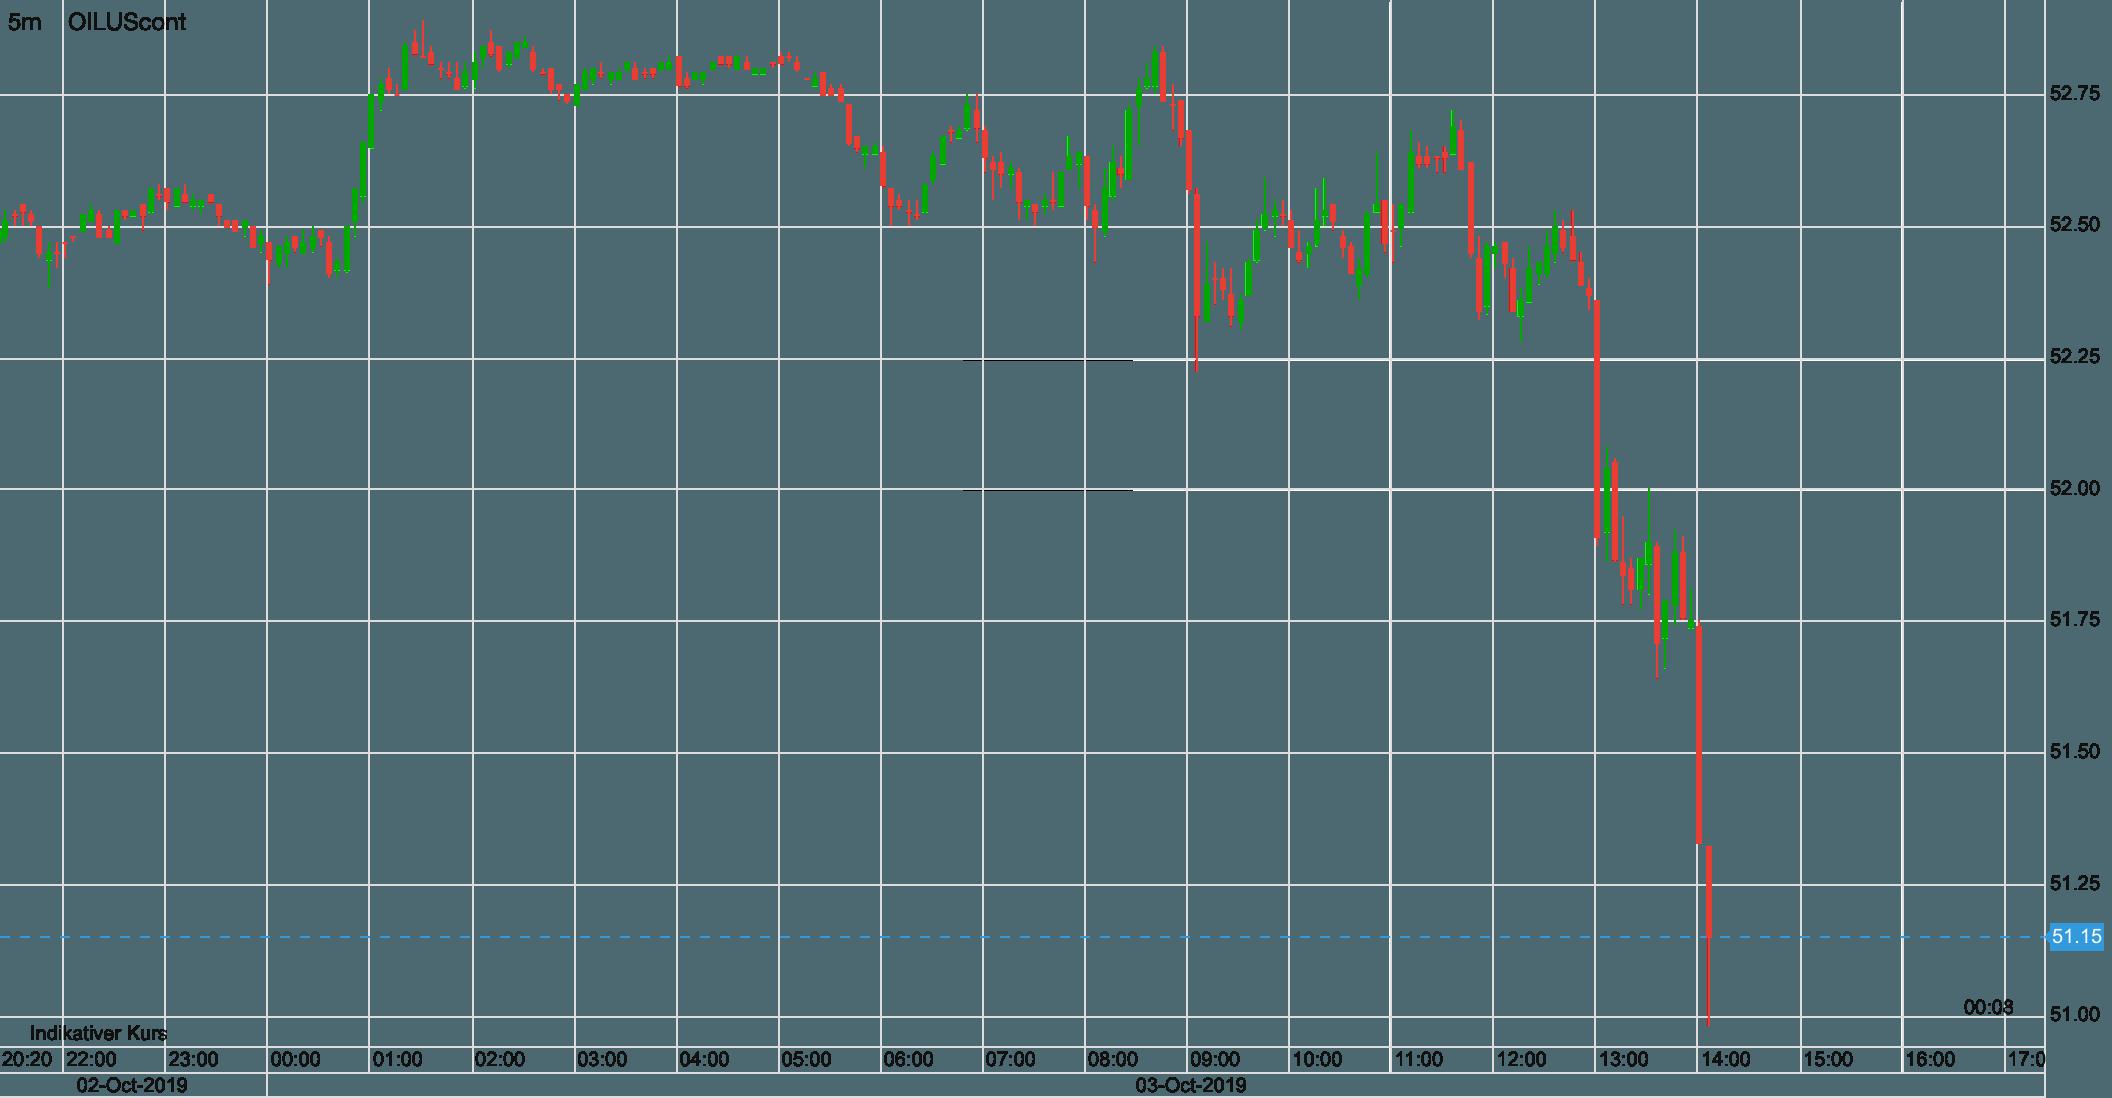 Ölpreis verliert stark nach ISM Daten